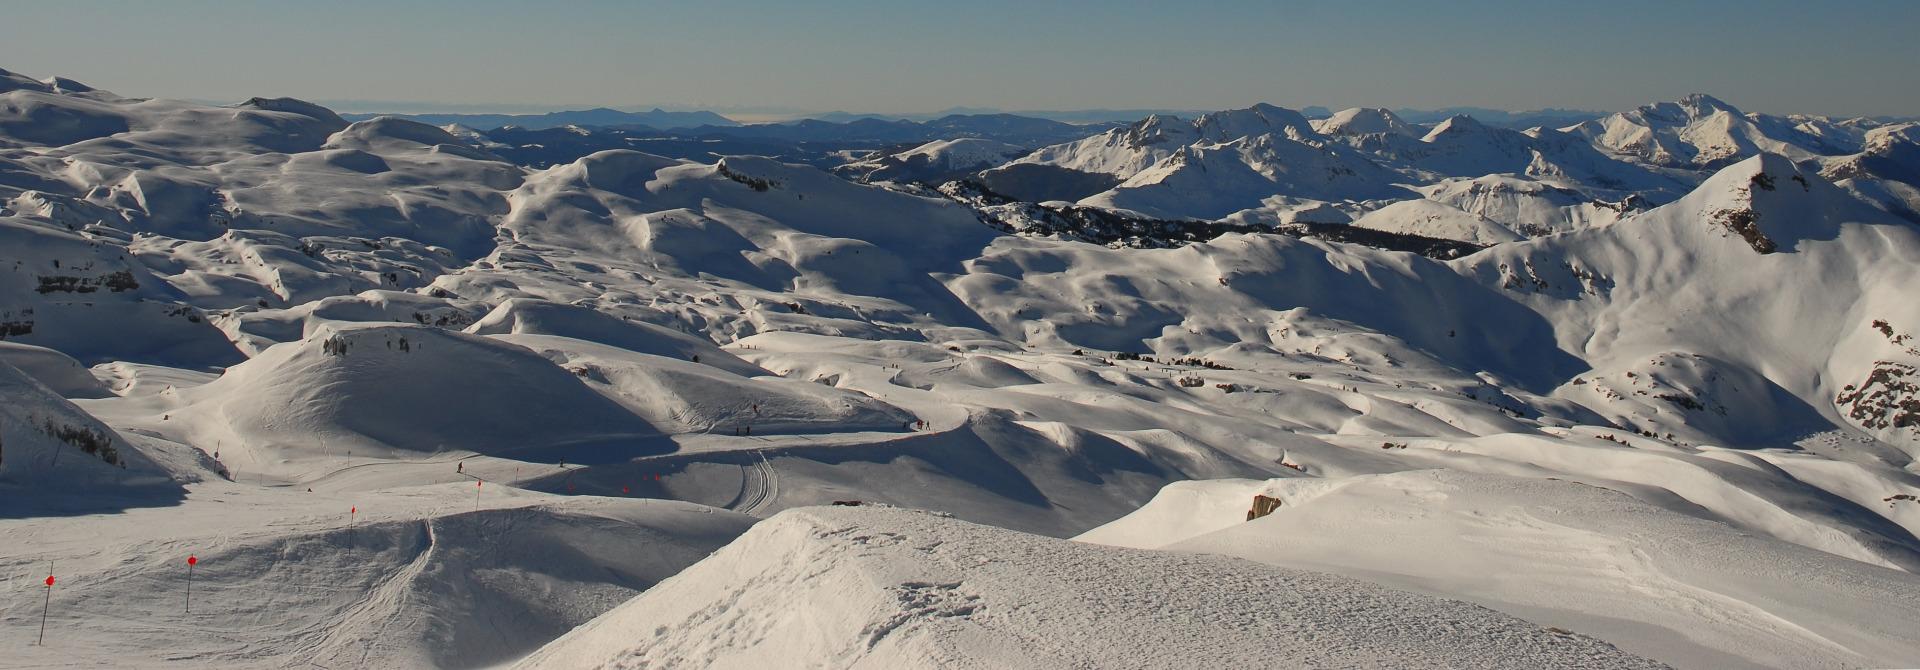 La Pierre St. Martin. N'PY Nuevos Pirineos - © N'PY Nuevos Pirineos